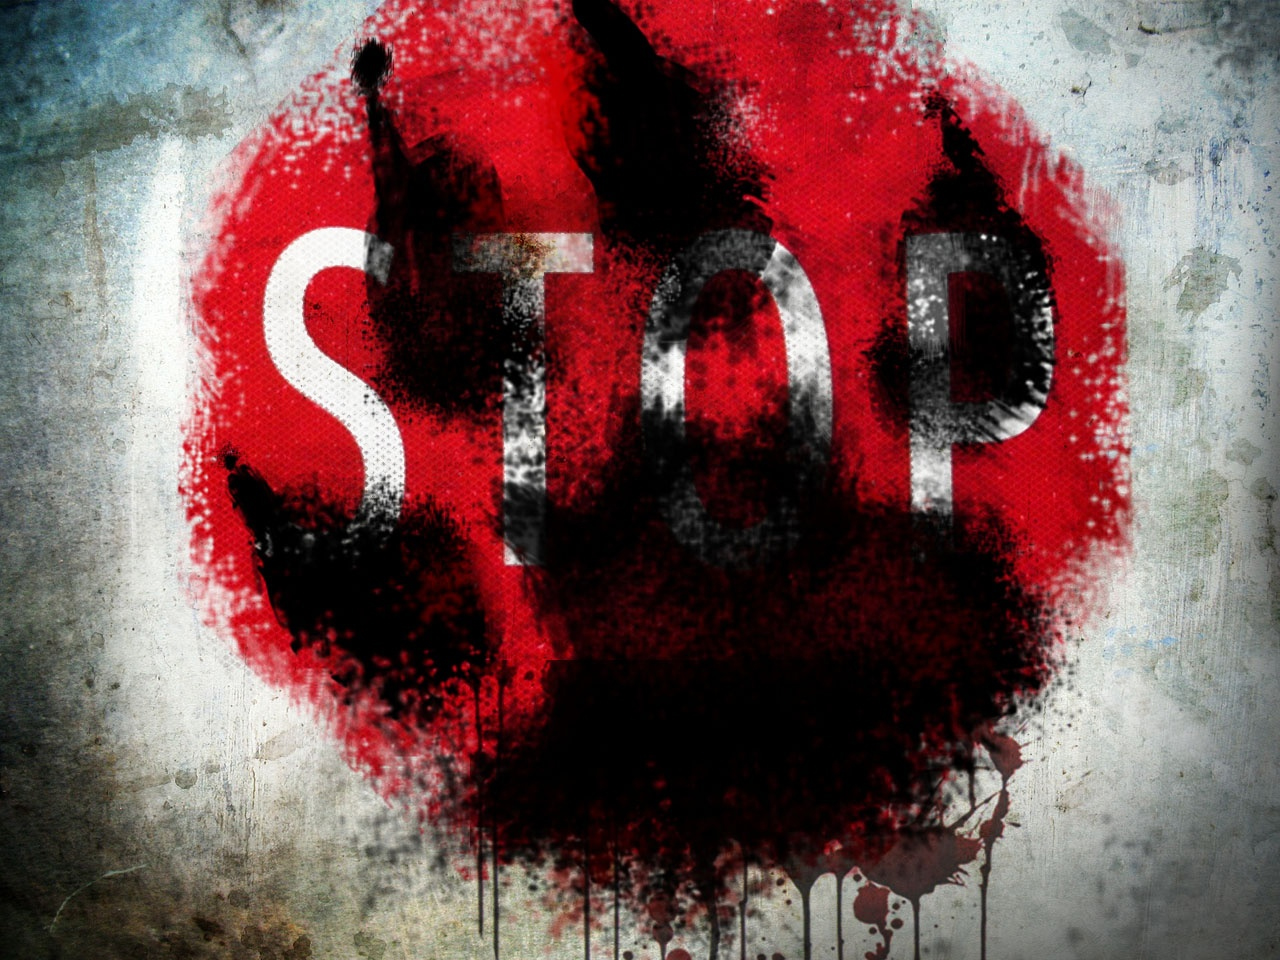 animal cruelty_stop_1559923291519.jpg.jpg